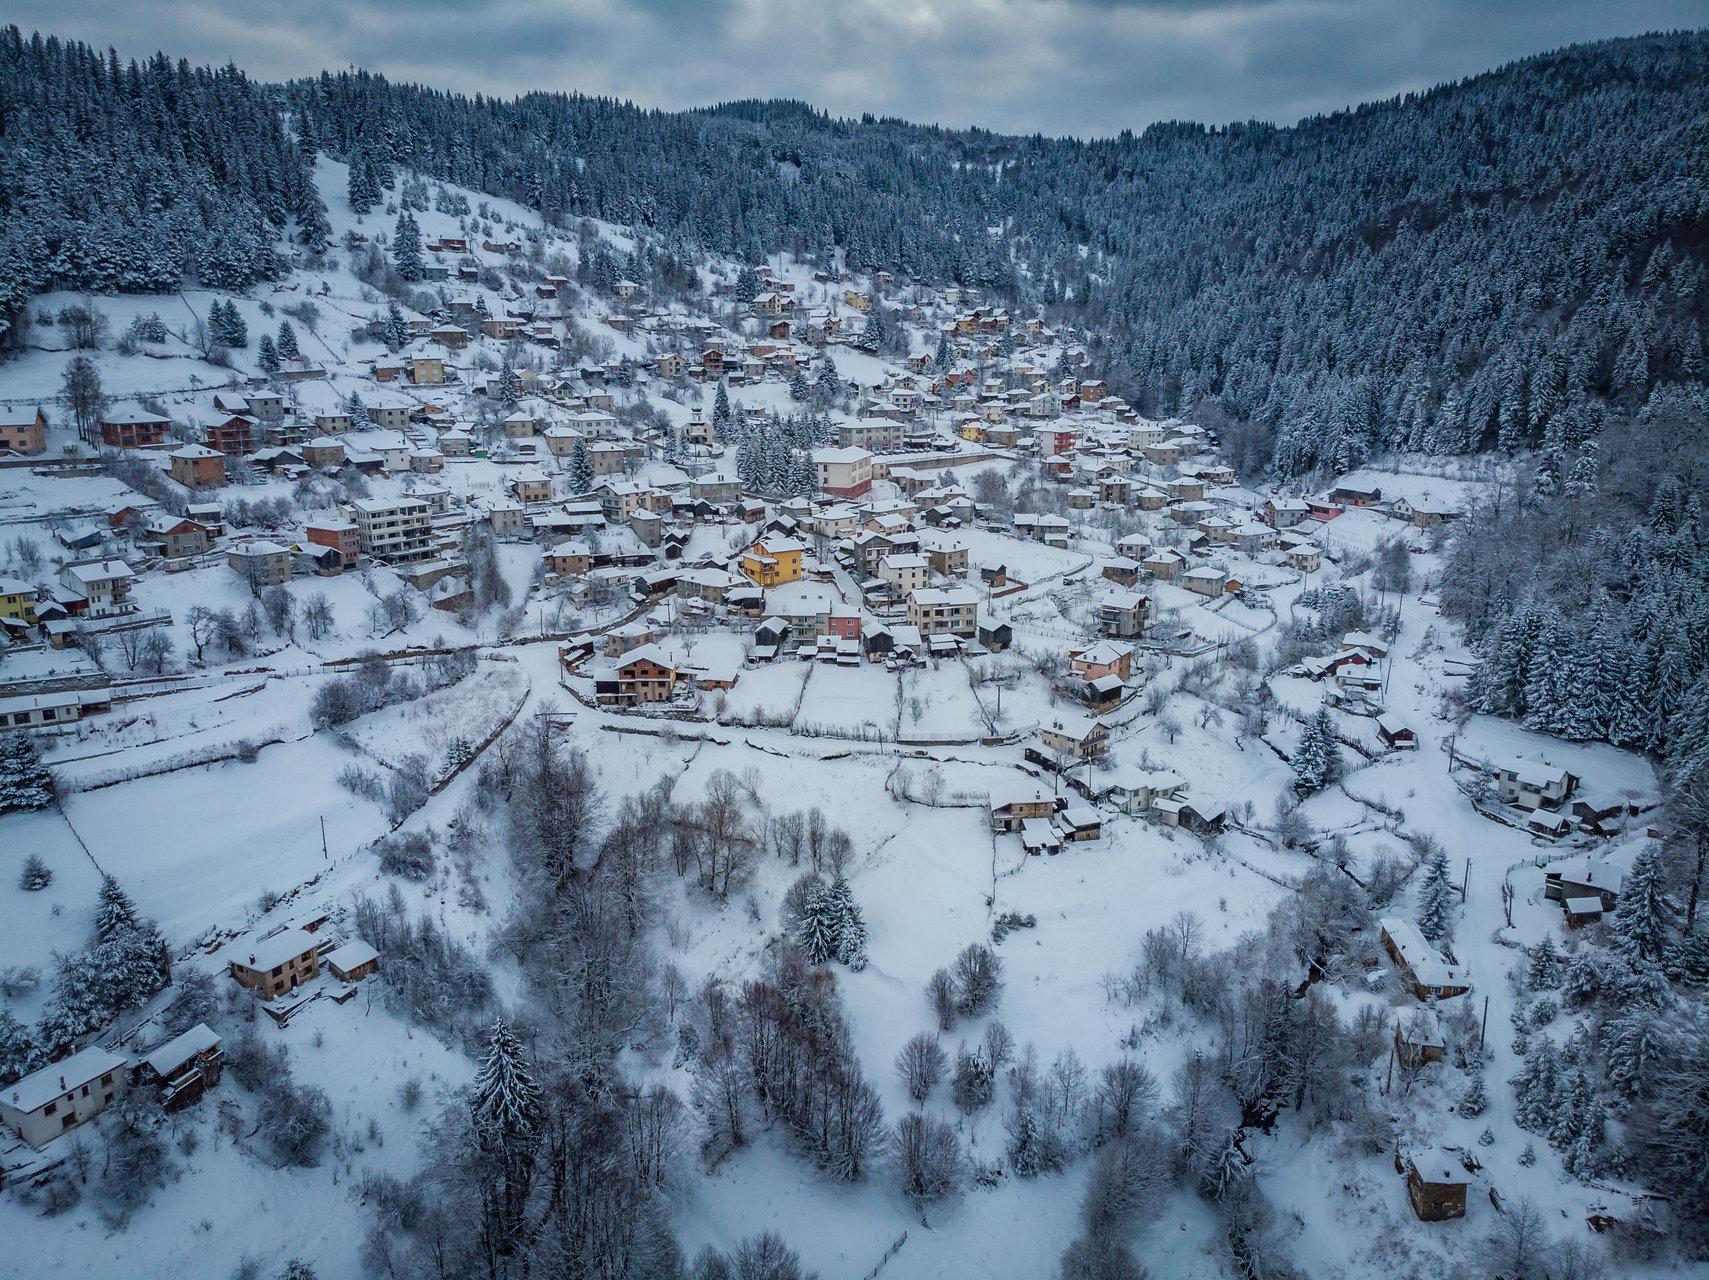 Photo in Aerial | Author Tihomir Petkov - Tihuana | PHOTO FORUM